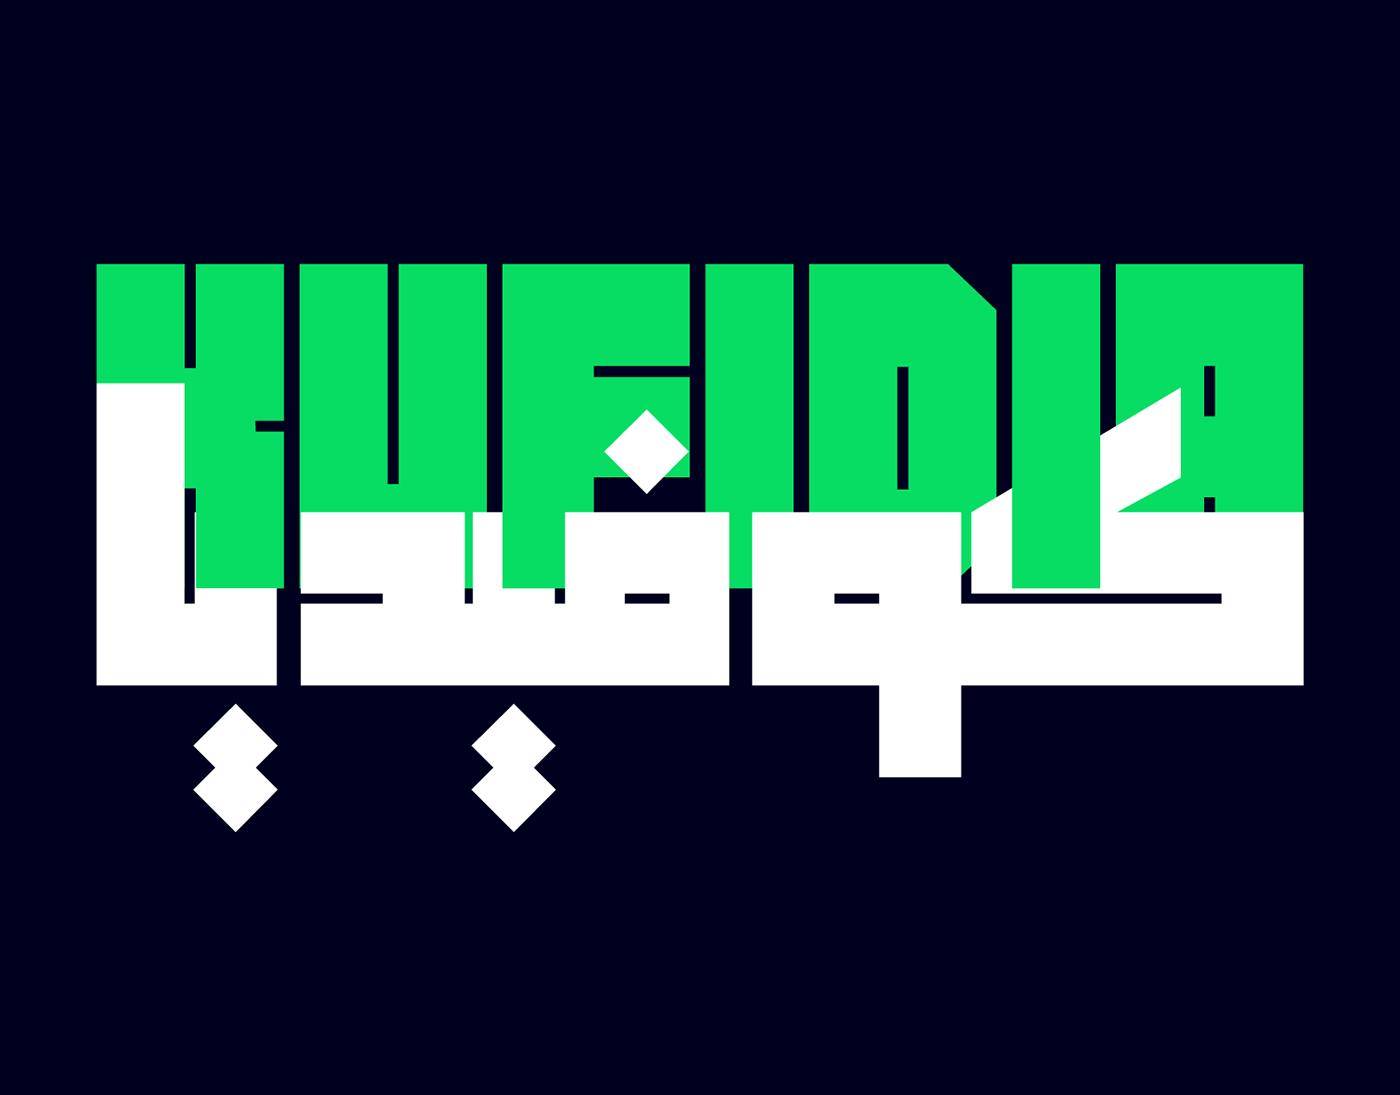 تحميل خط كوفيديا الجديد - Kufidia Typeface